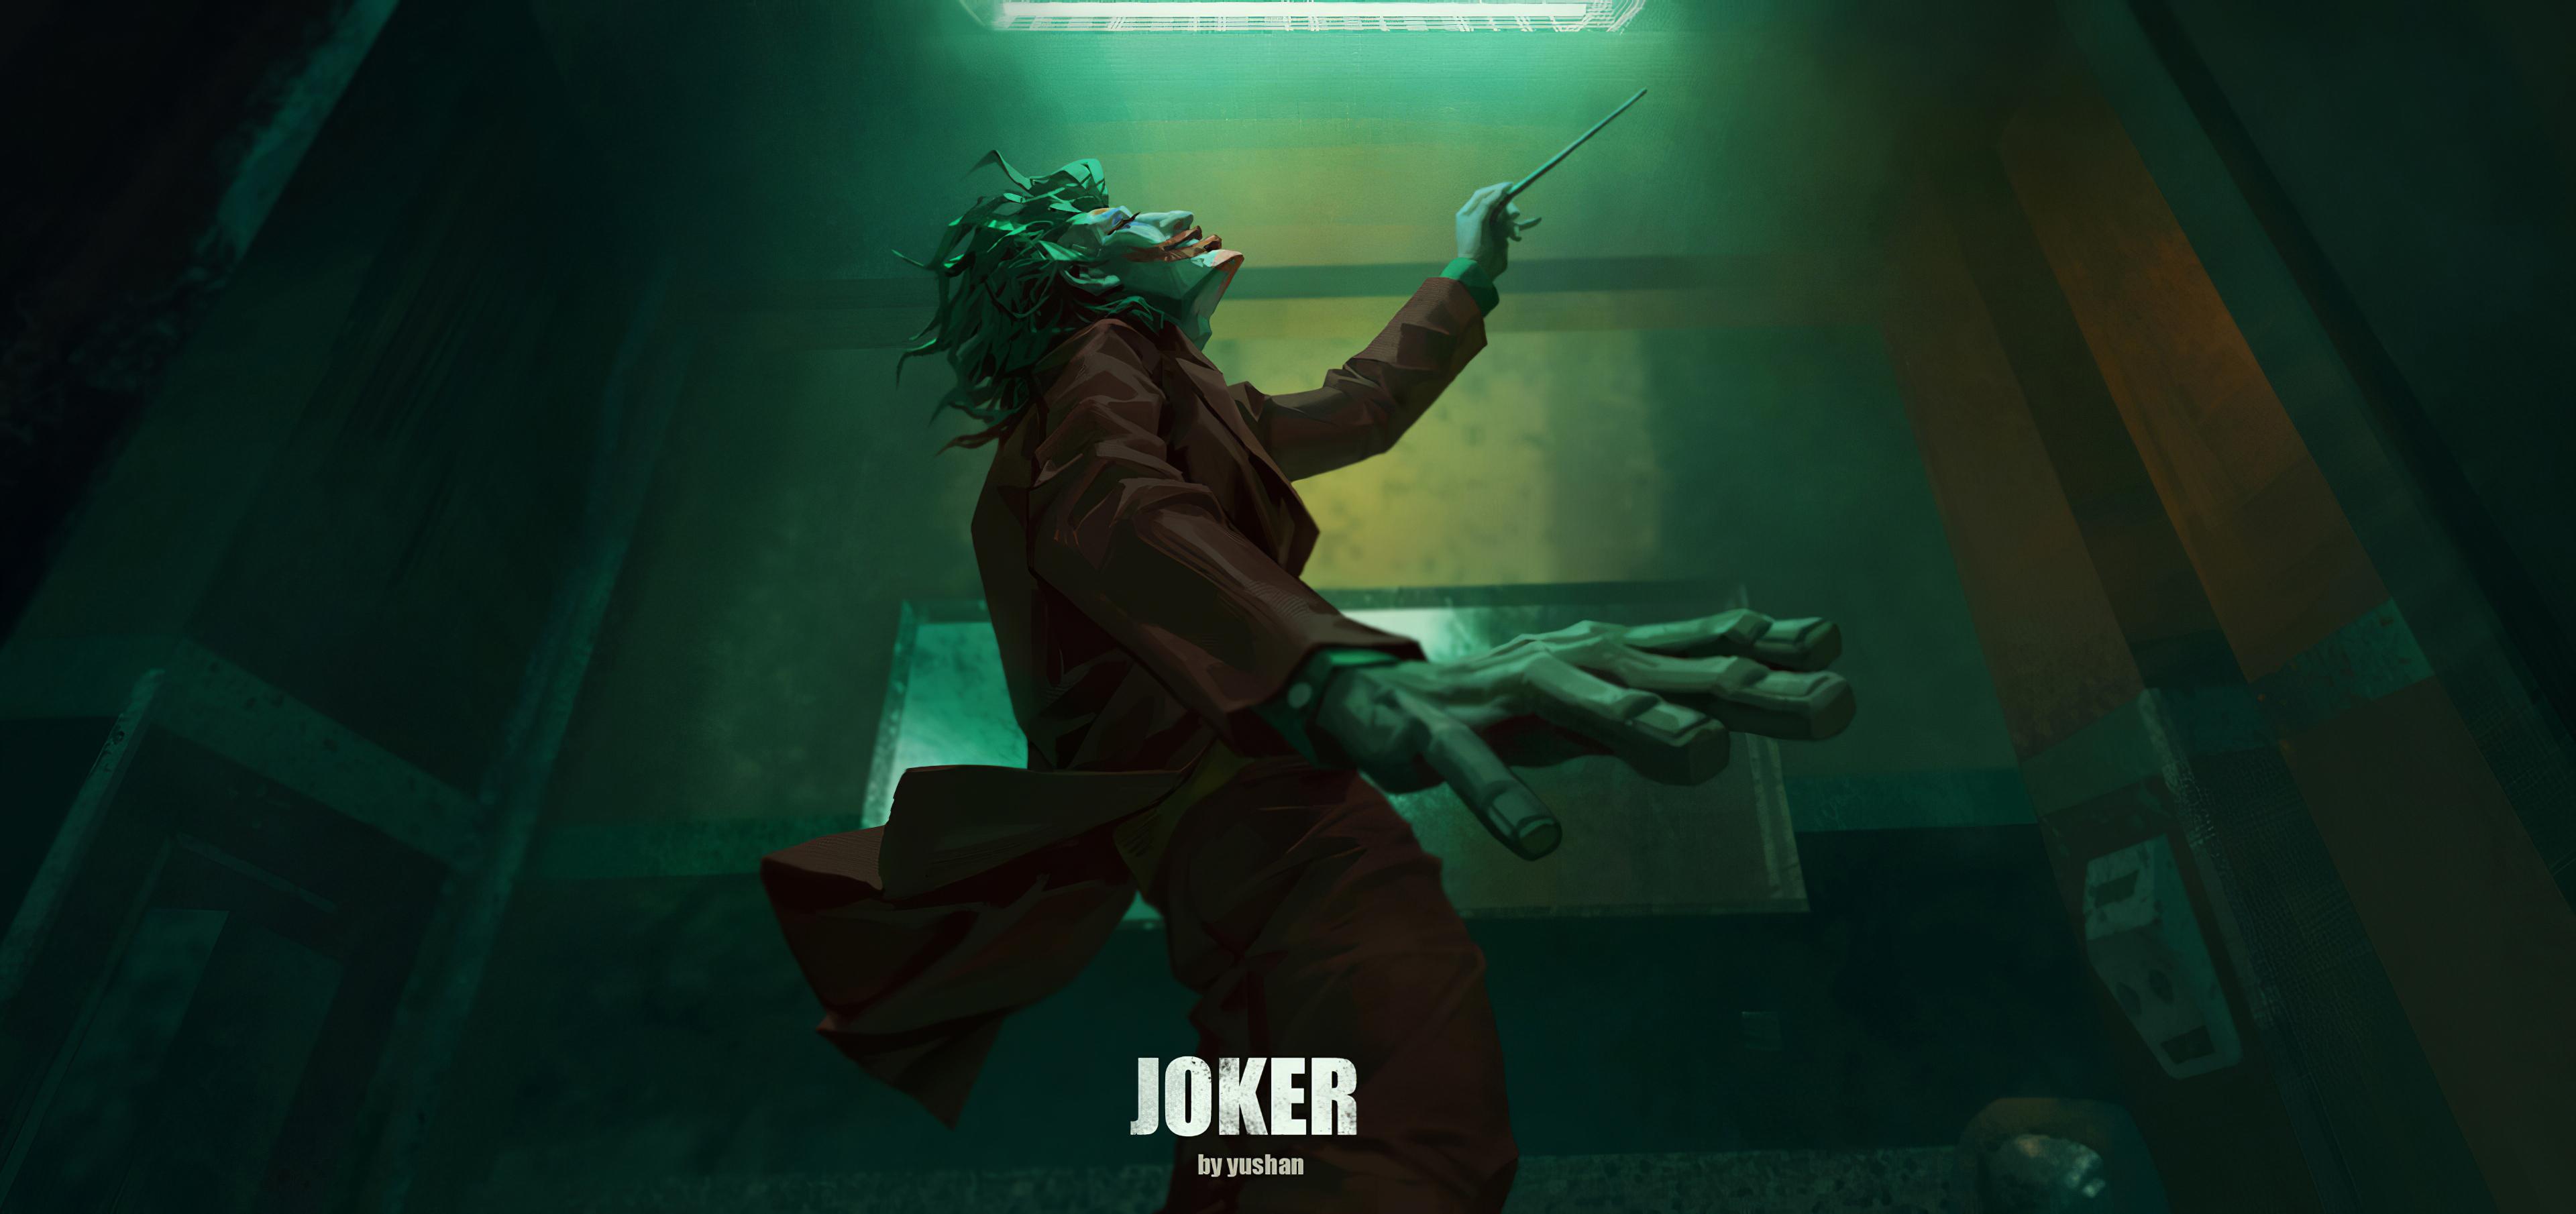 joker perform art 1576097999 - Joker Perform Art - Joker wallpaper 4k hd, joker phone wallpaper hd 4k, joker hd wallpaper 4k, joker art wallpaper hd 4k, 4k wallpaper joker